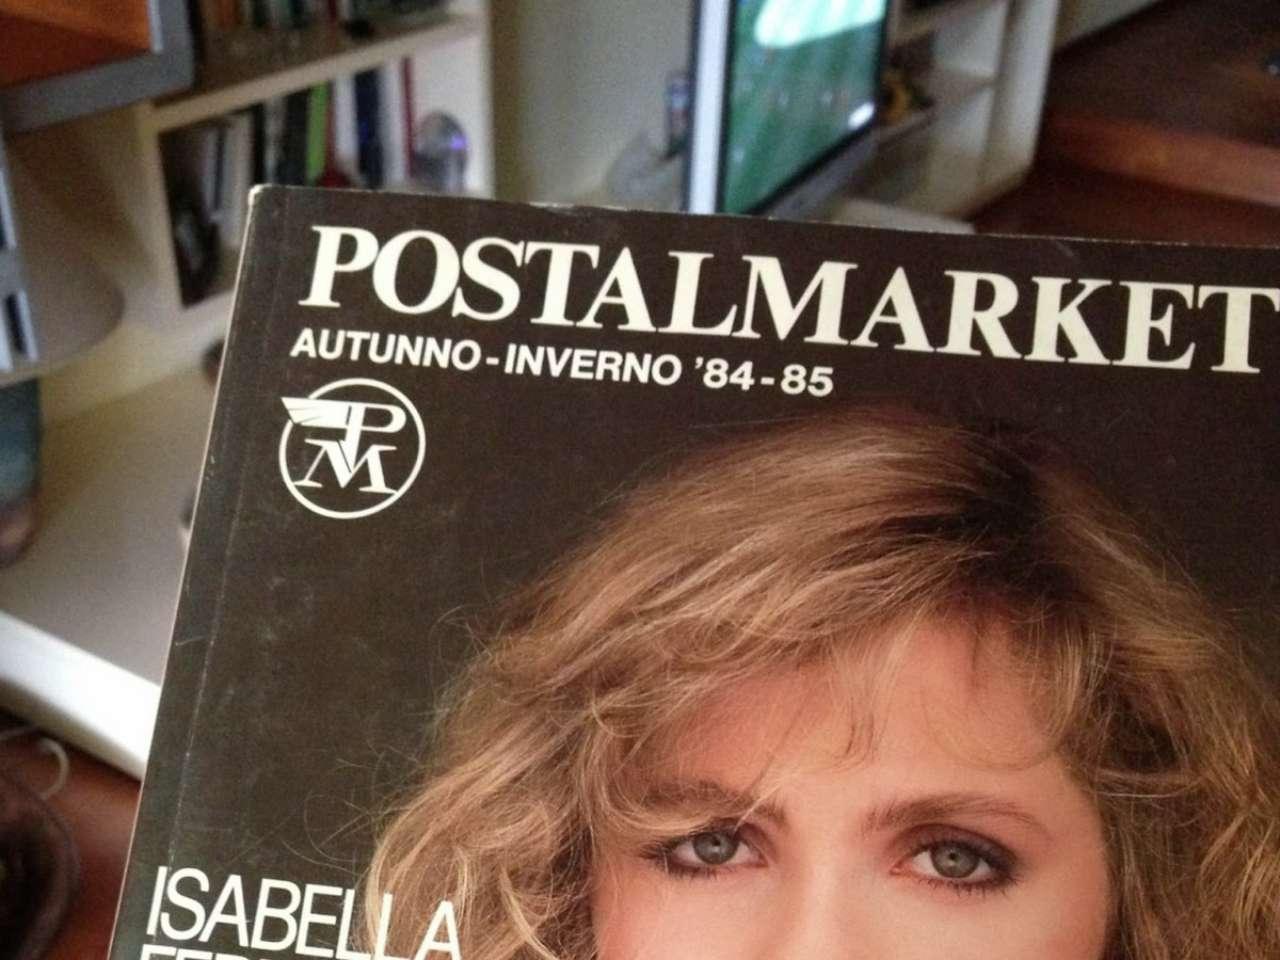 postalmarket (web source)